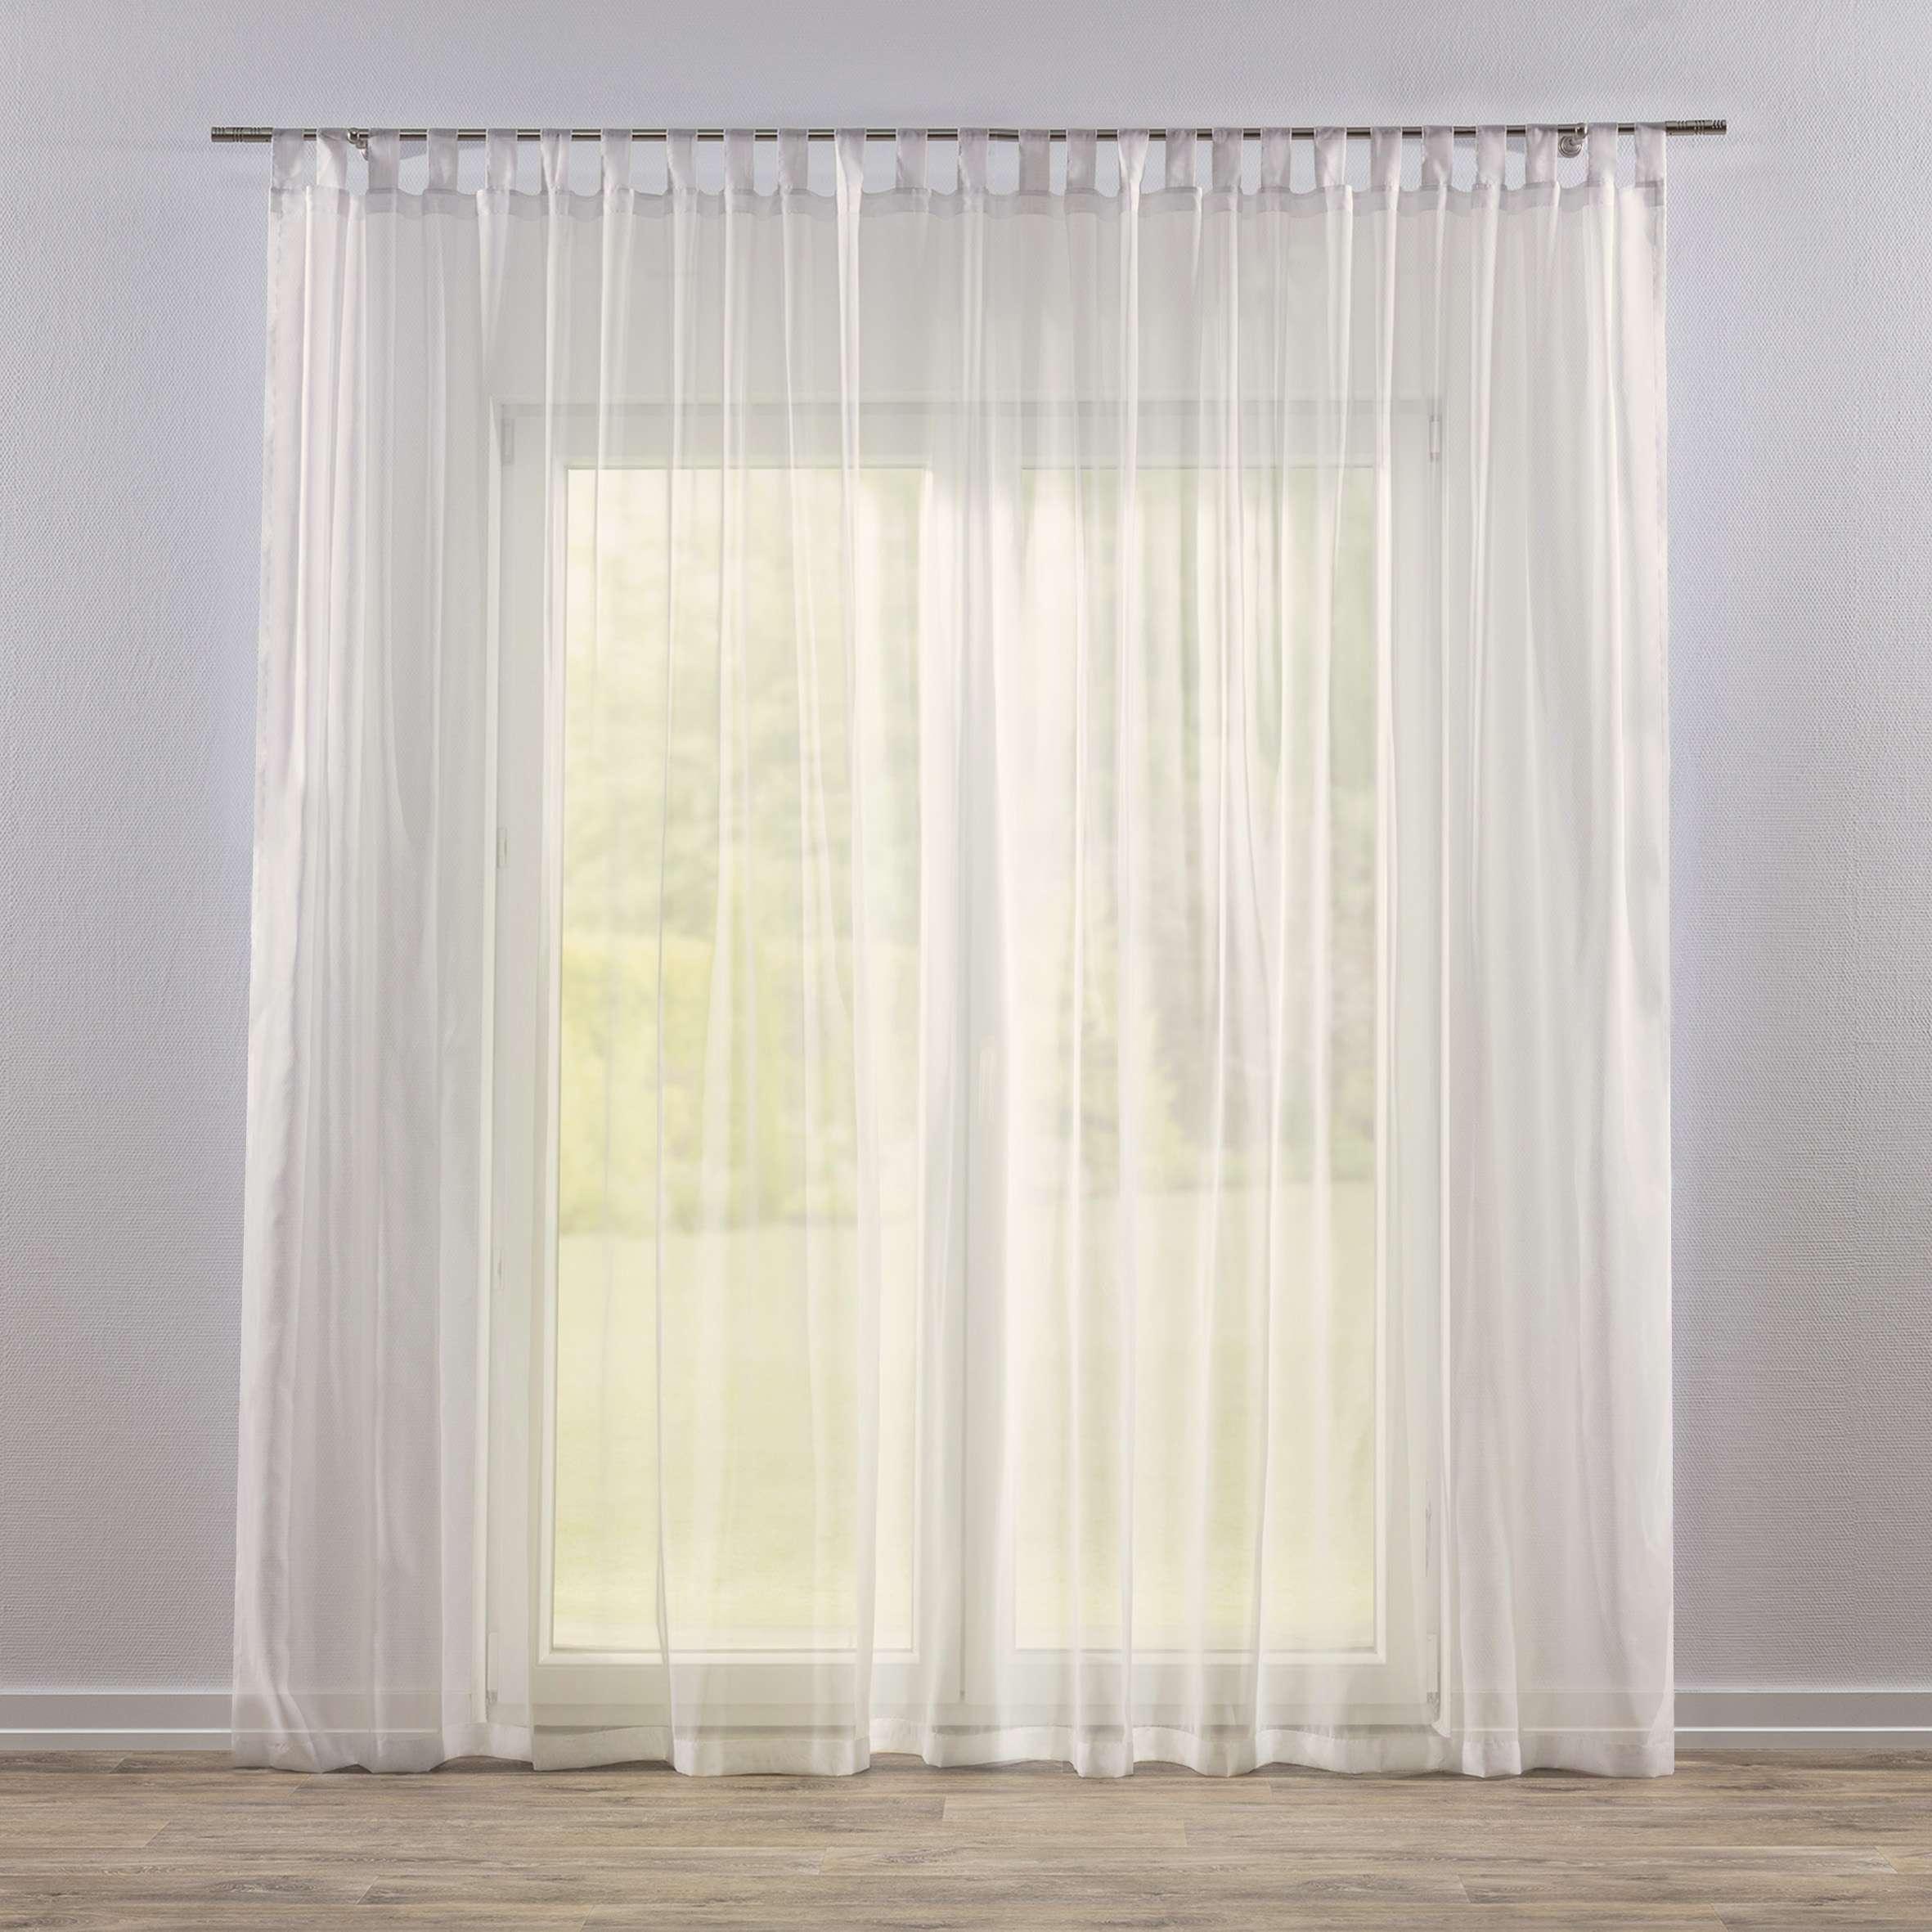 Záclona z voálu na pútkach V kolekcii Voálové záclony, tkanina: 900-01